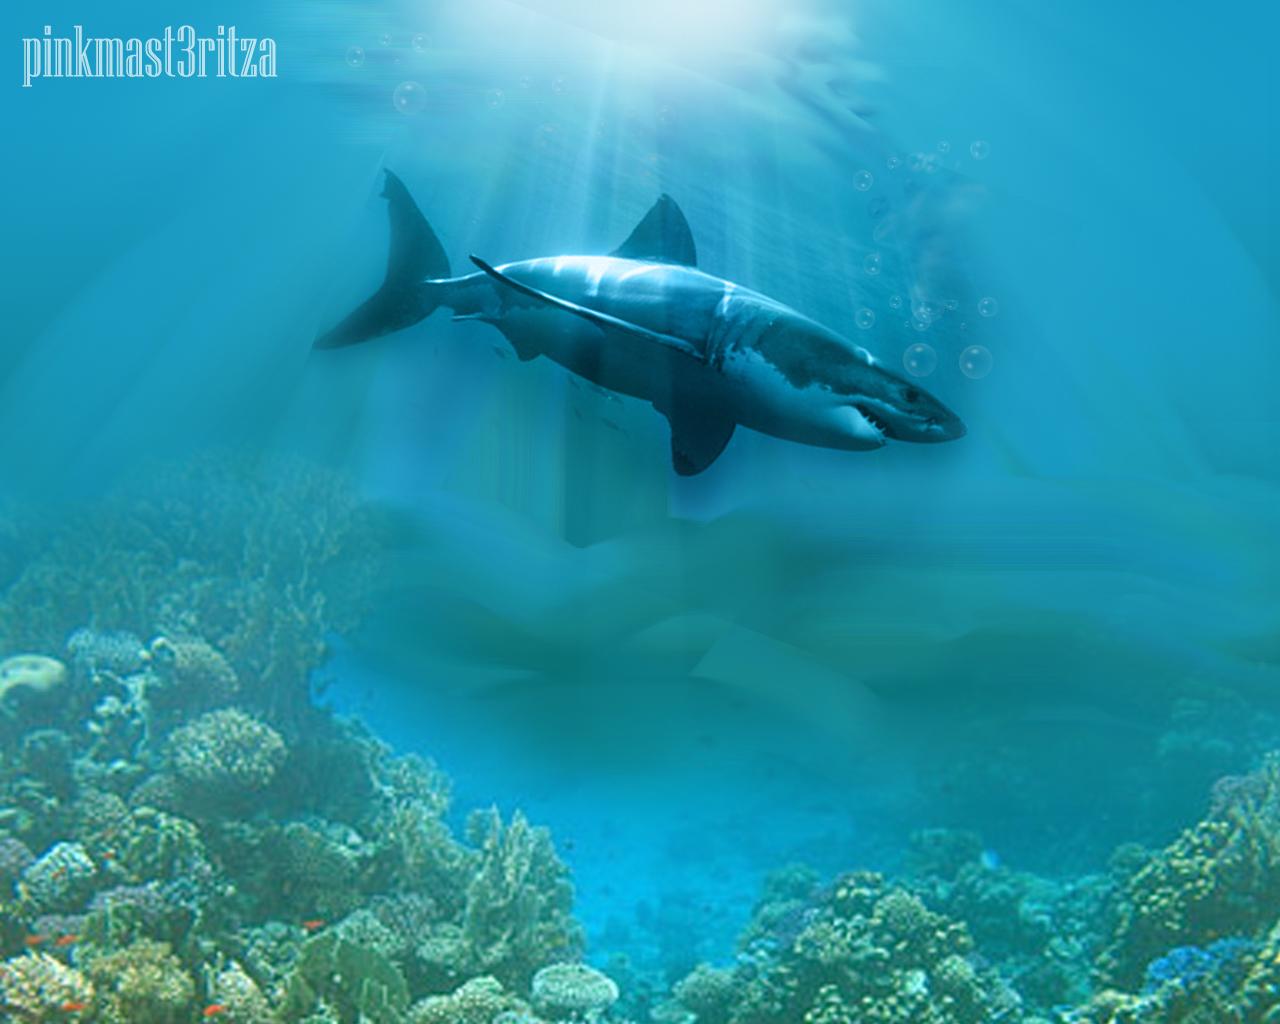 photoshop tutorials how to create underwater scene using photoshop